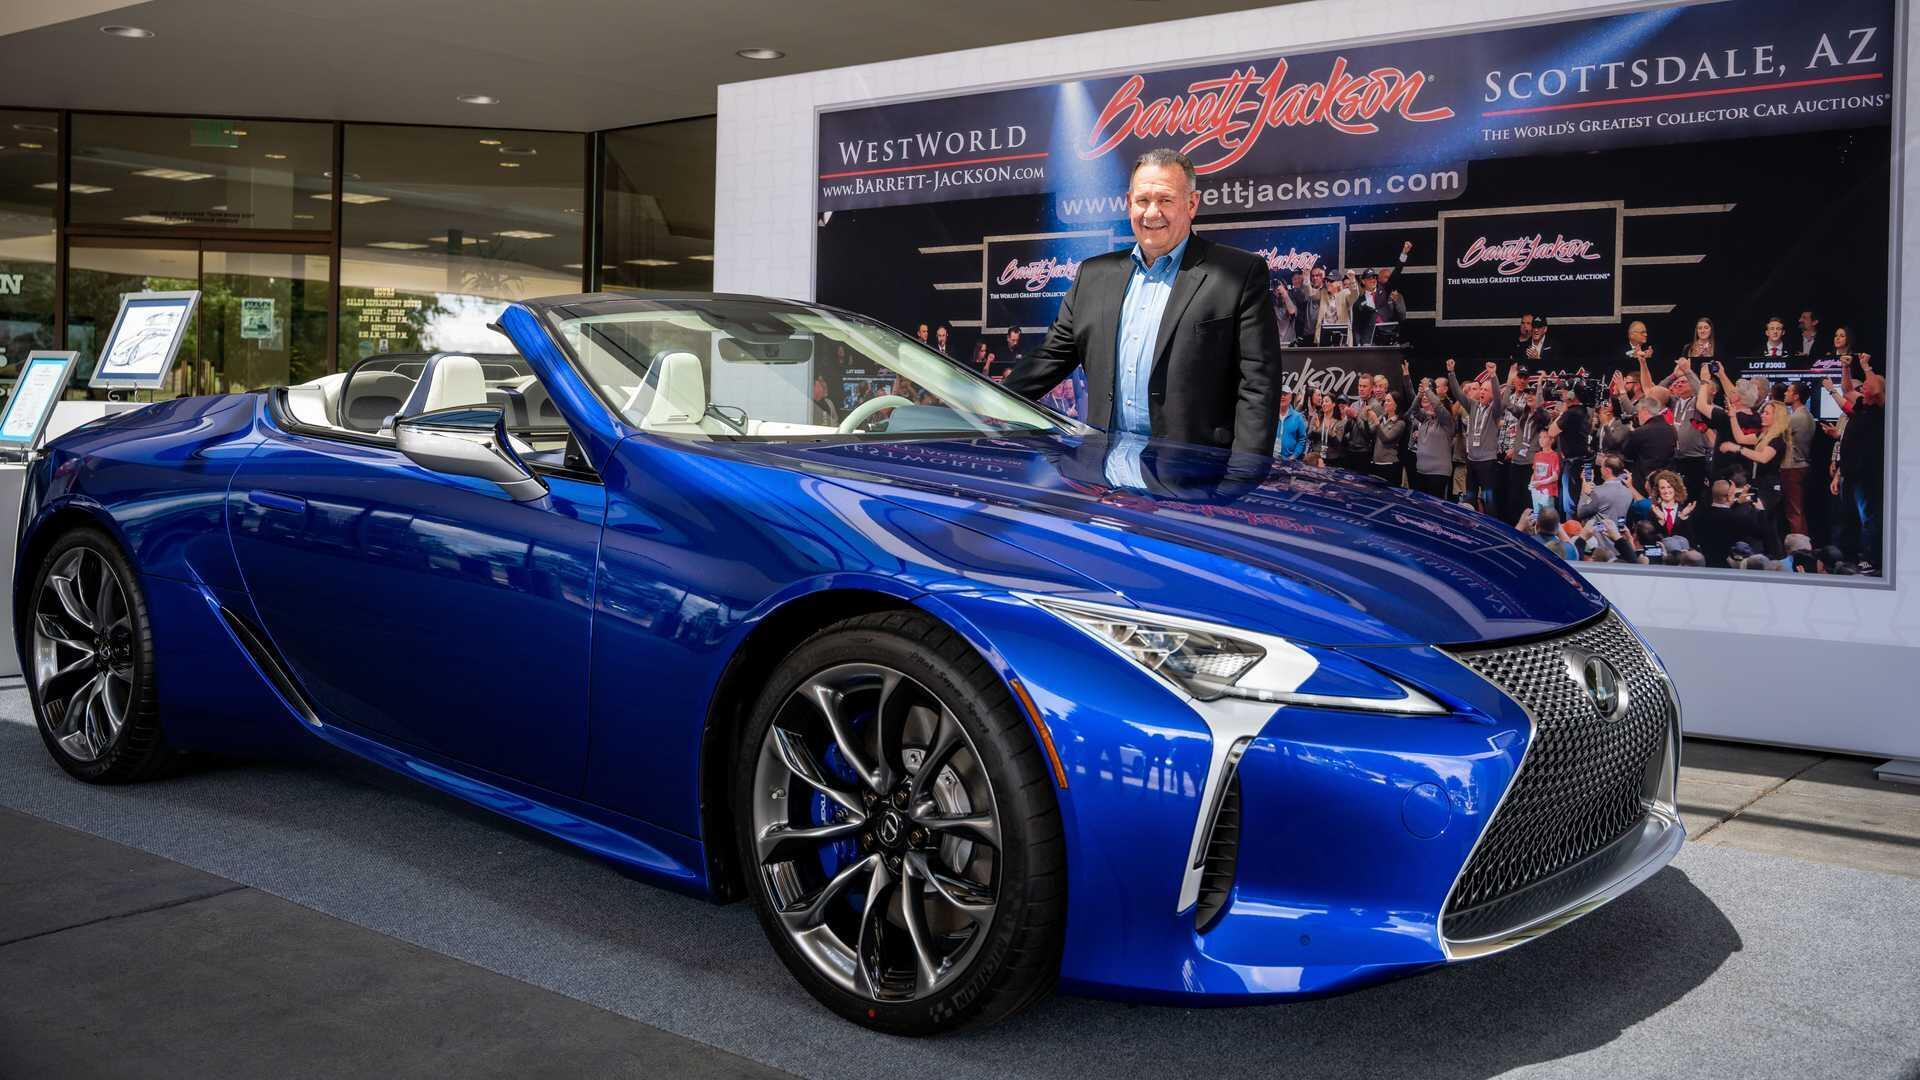 chiec-lexus-lc-500-convertible-2021-gia-2-trieu-usd-duoc-giao-den-tay-khach-hang